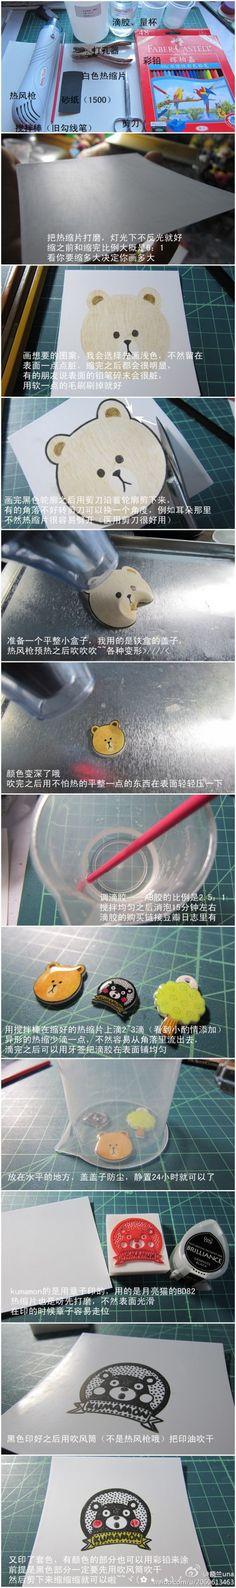 熱縮片 教程 @http://photo.weibo.com/2011658674/wbphotos/large/mid/3668183040991323/pid/77e779b2jw1ecny43xj3fj20c82aagy8